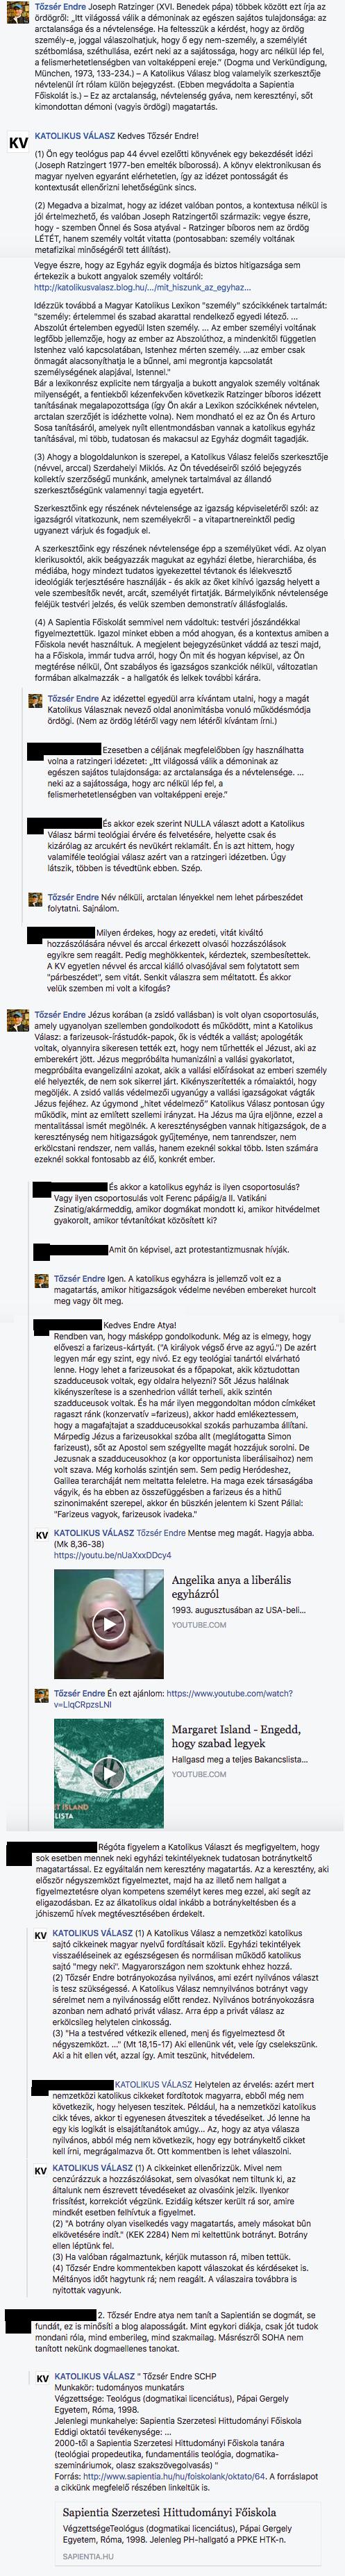 tozser_vita.png